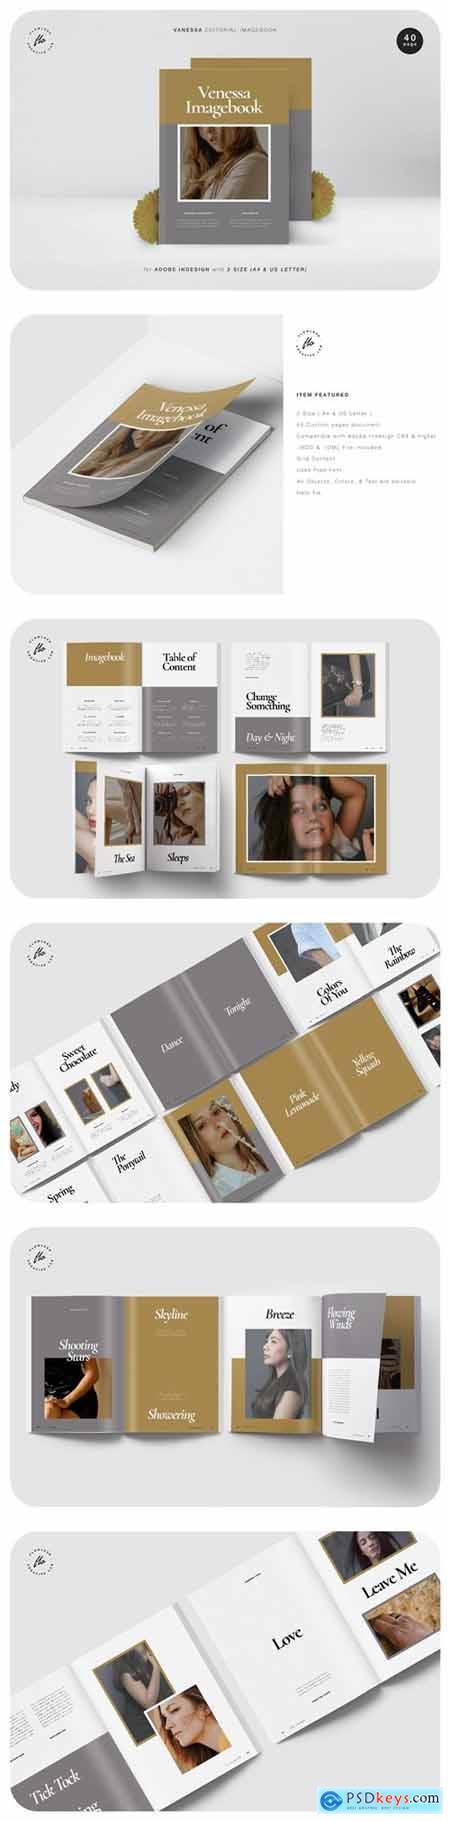 Venessa Editorial Imagebook